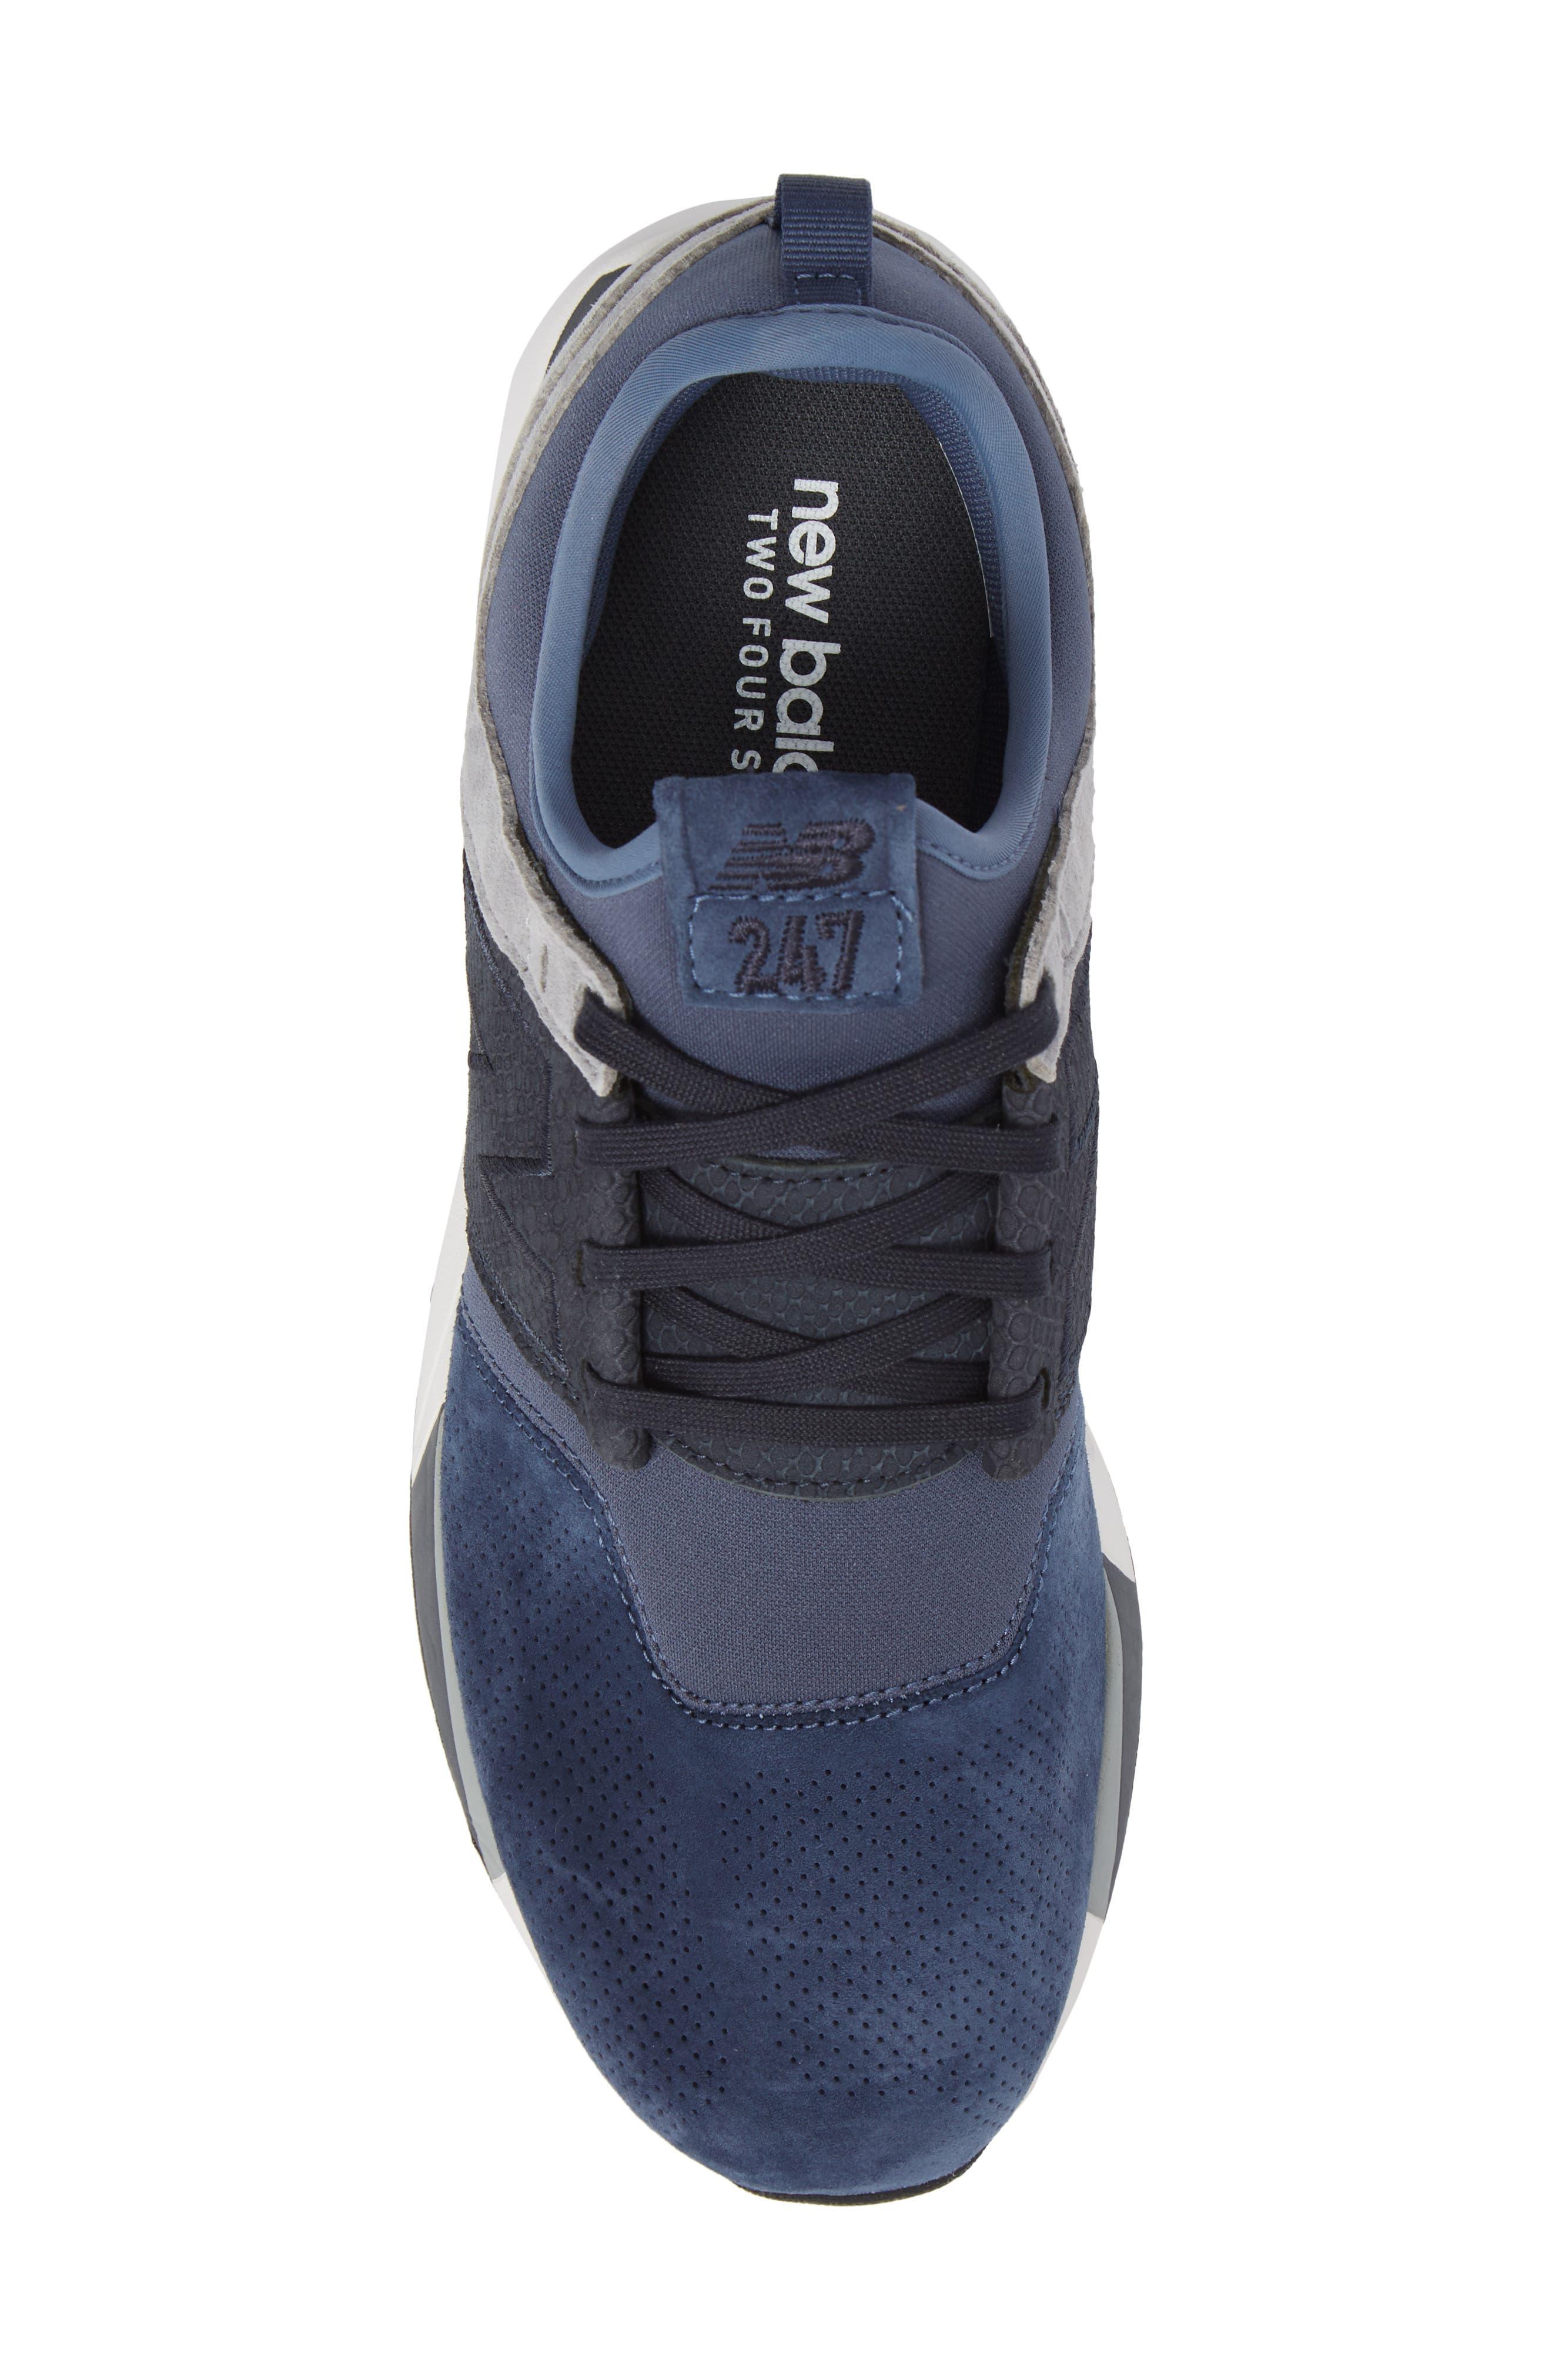 247 Luxe Sneaker,                             Alternate thumbnail 5, color,                             Blue